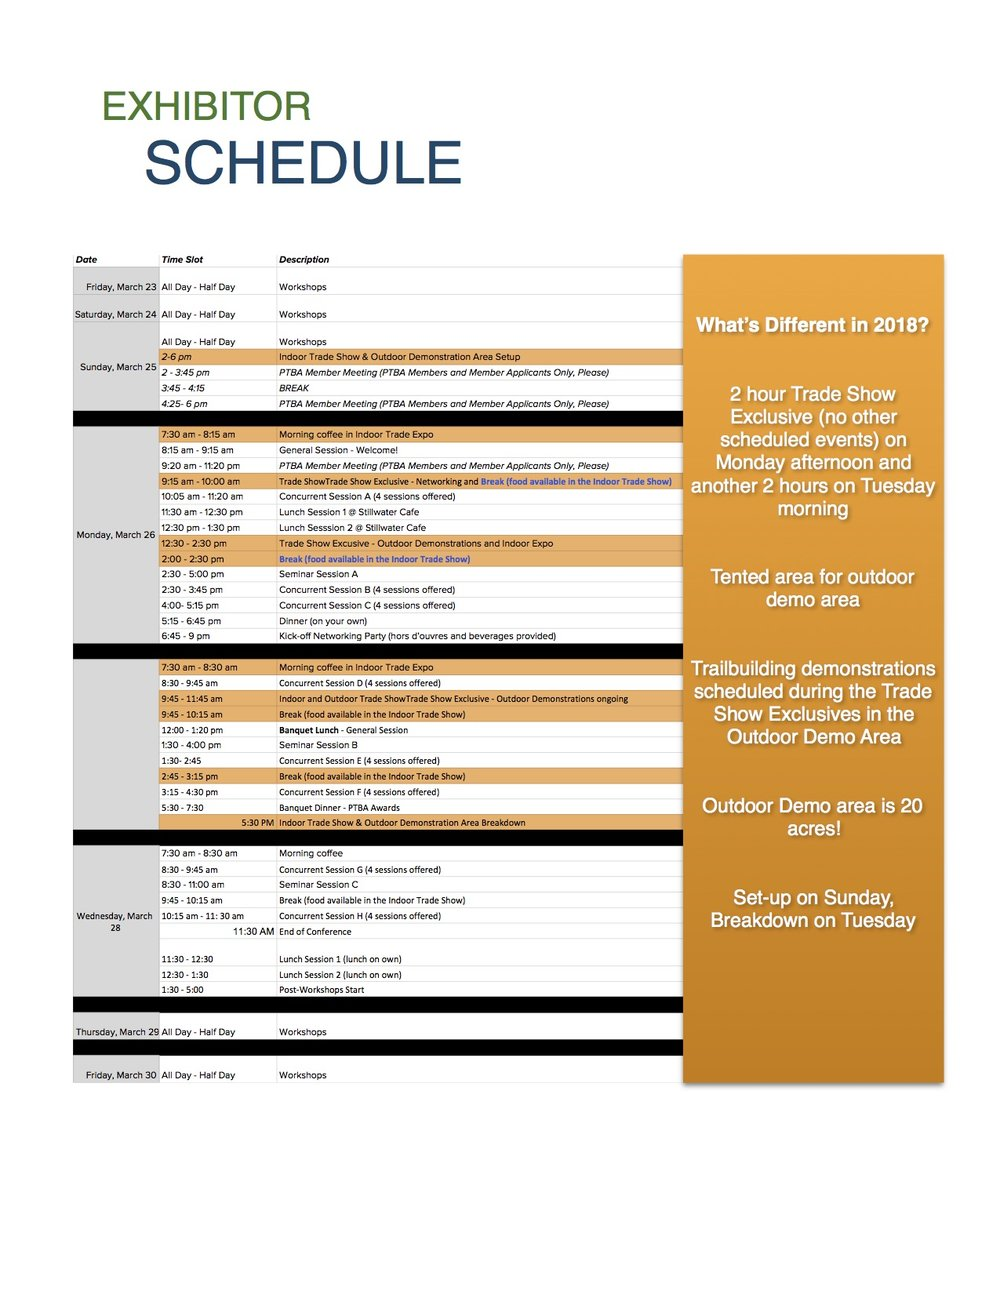 Stonewall 2018 Exhibitors Schedule.jpg